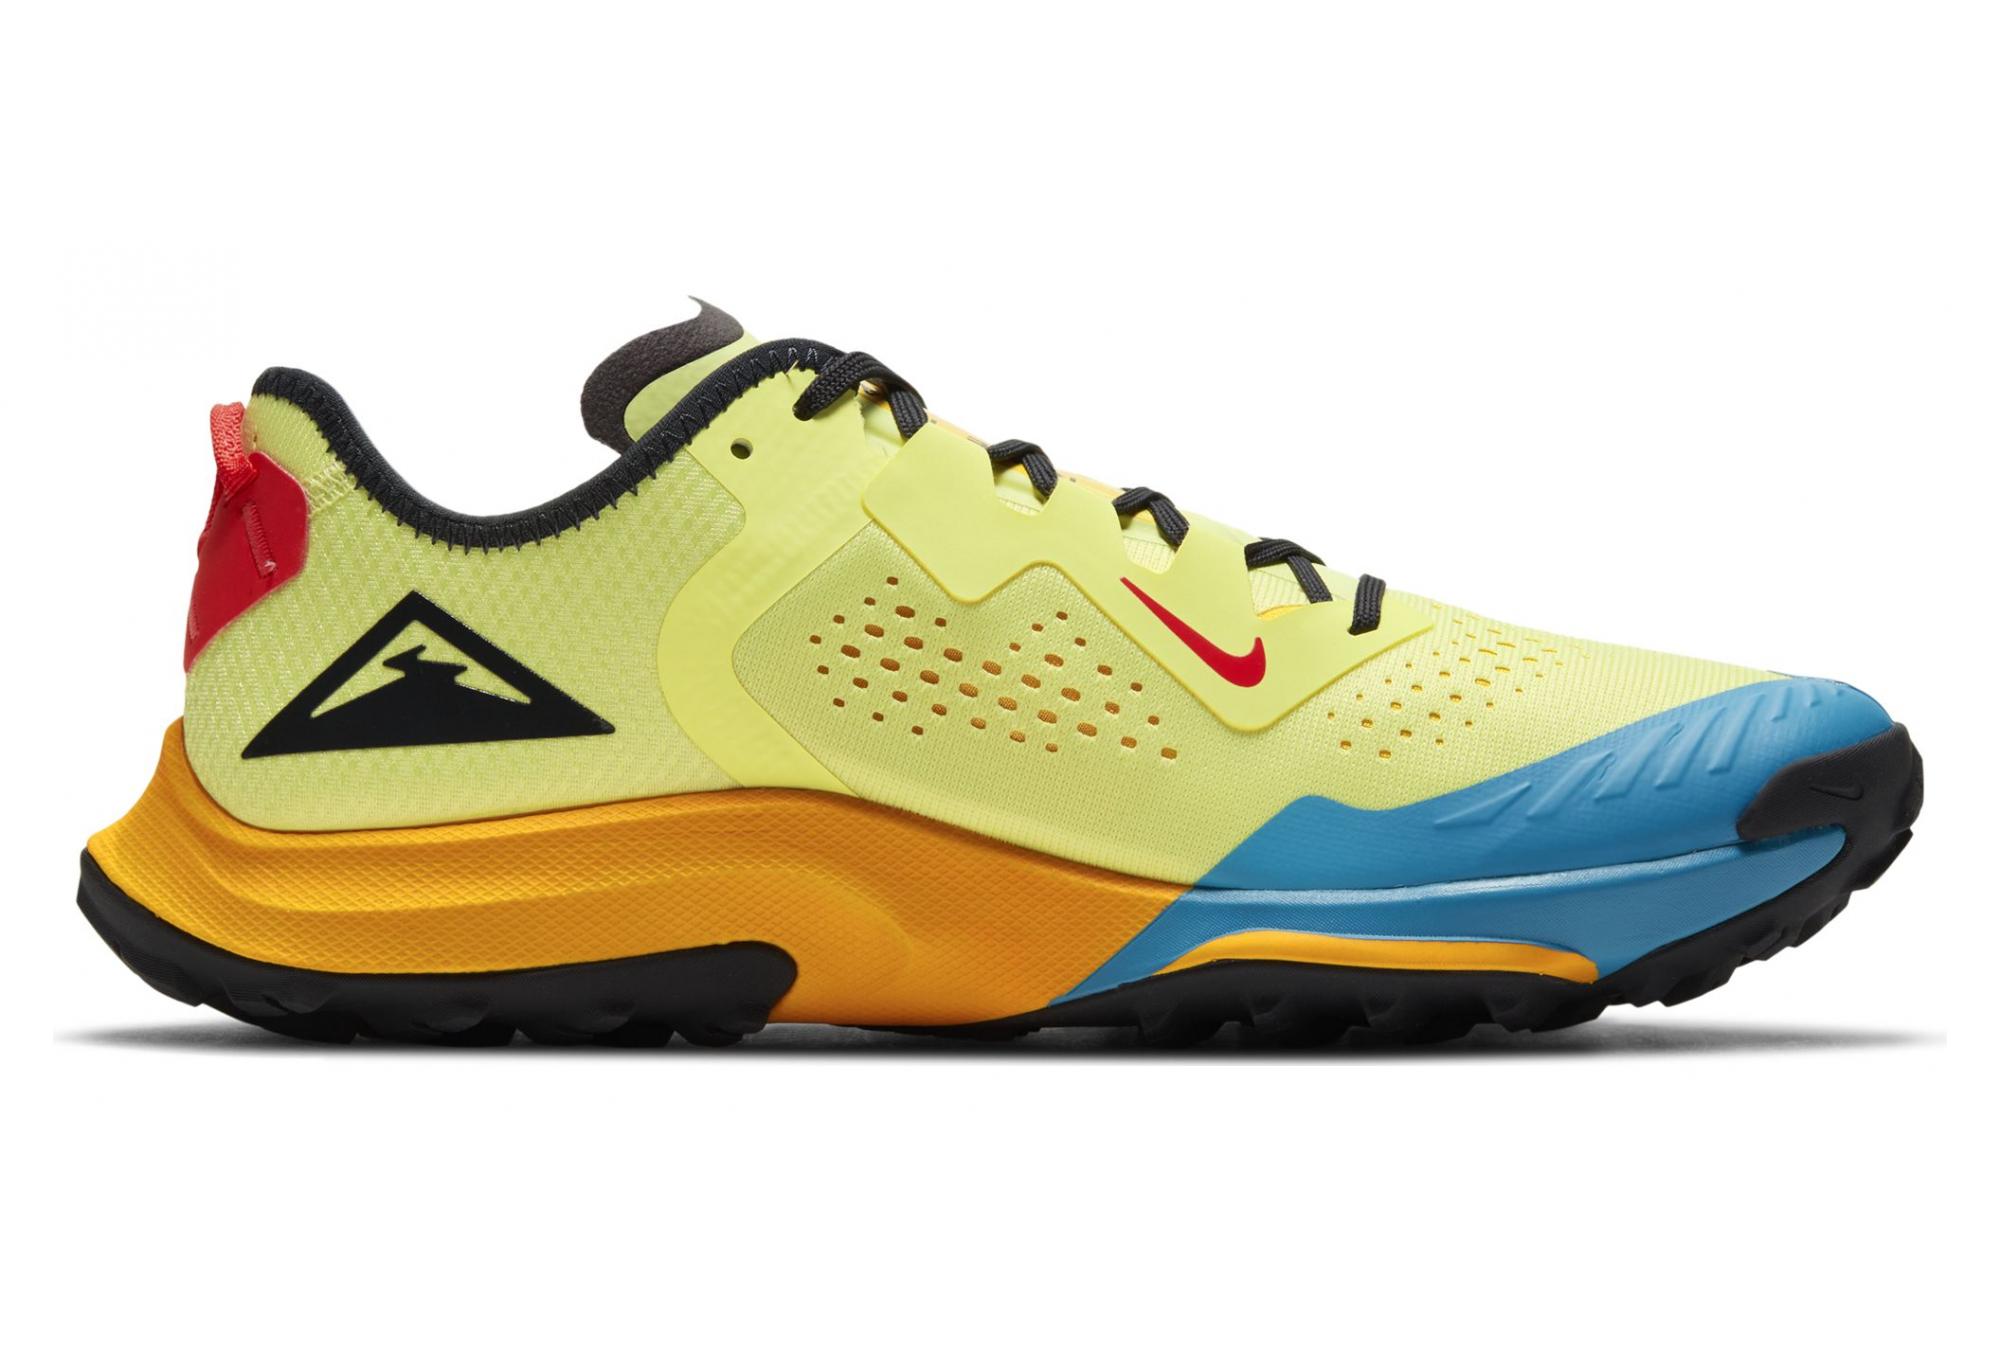 Nike Air Zoom Terra Kiger 7 Trail Shoes Yellow Blue Men